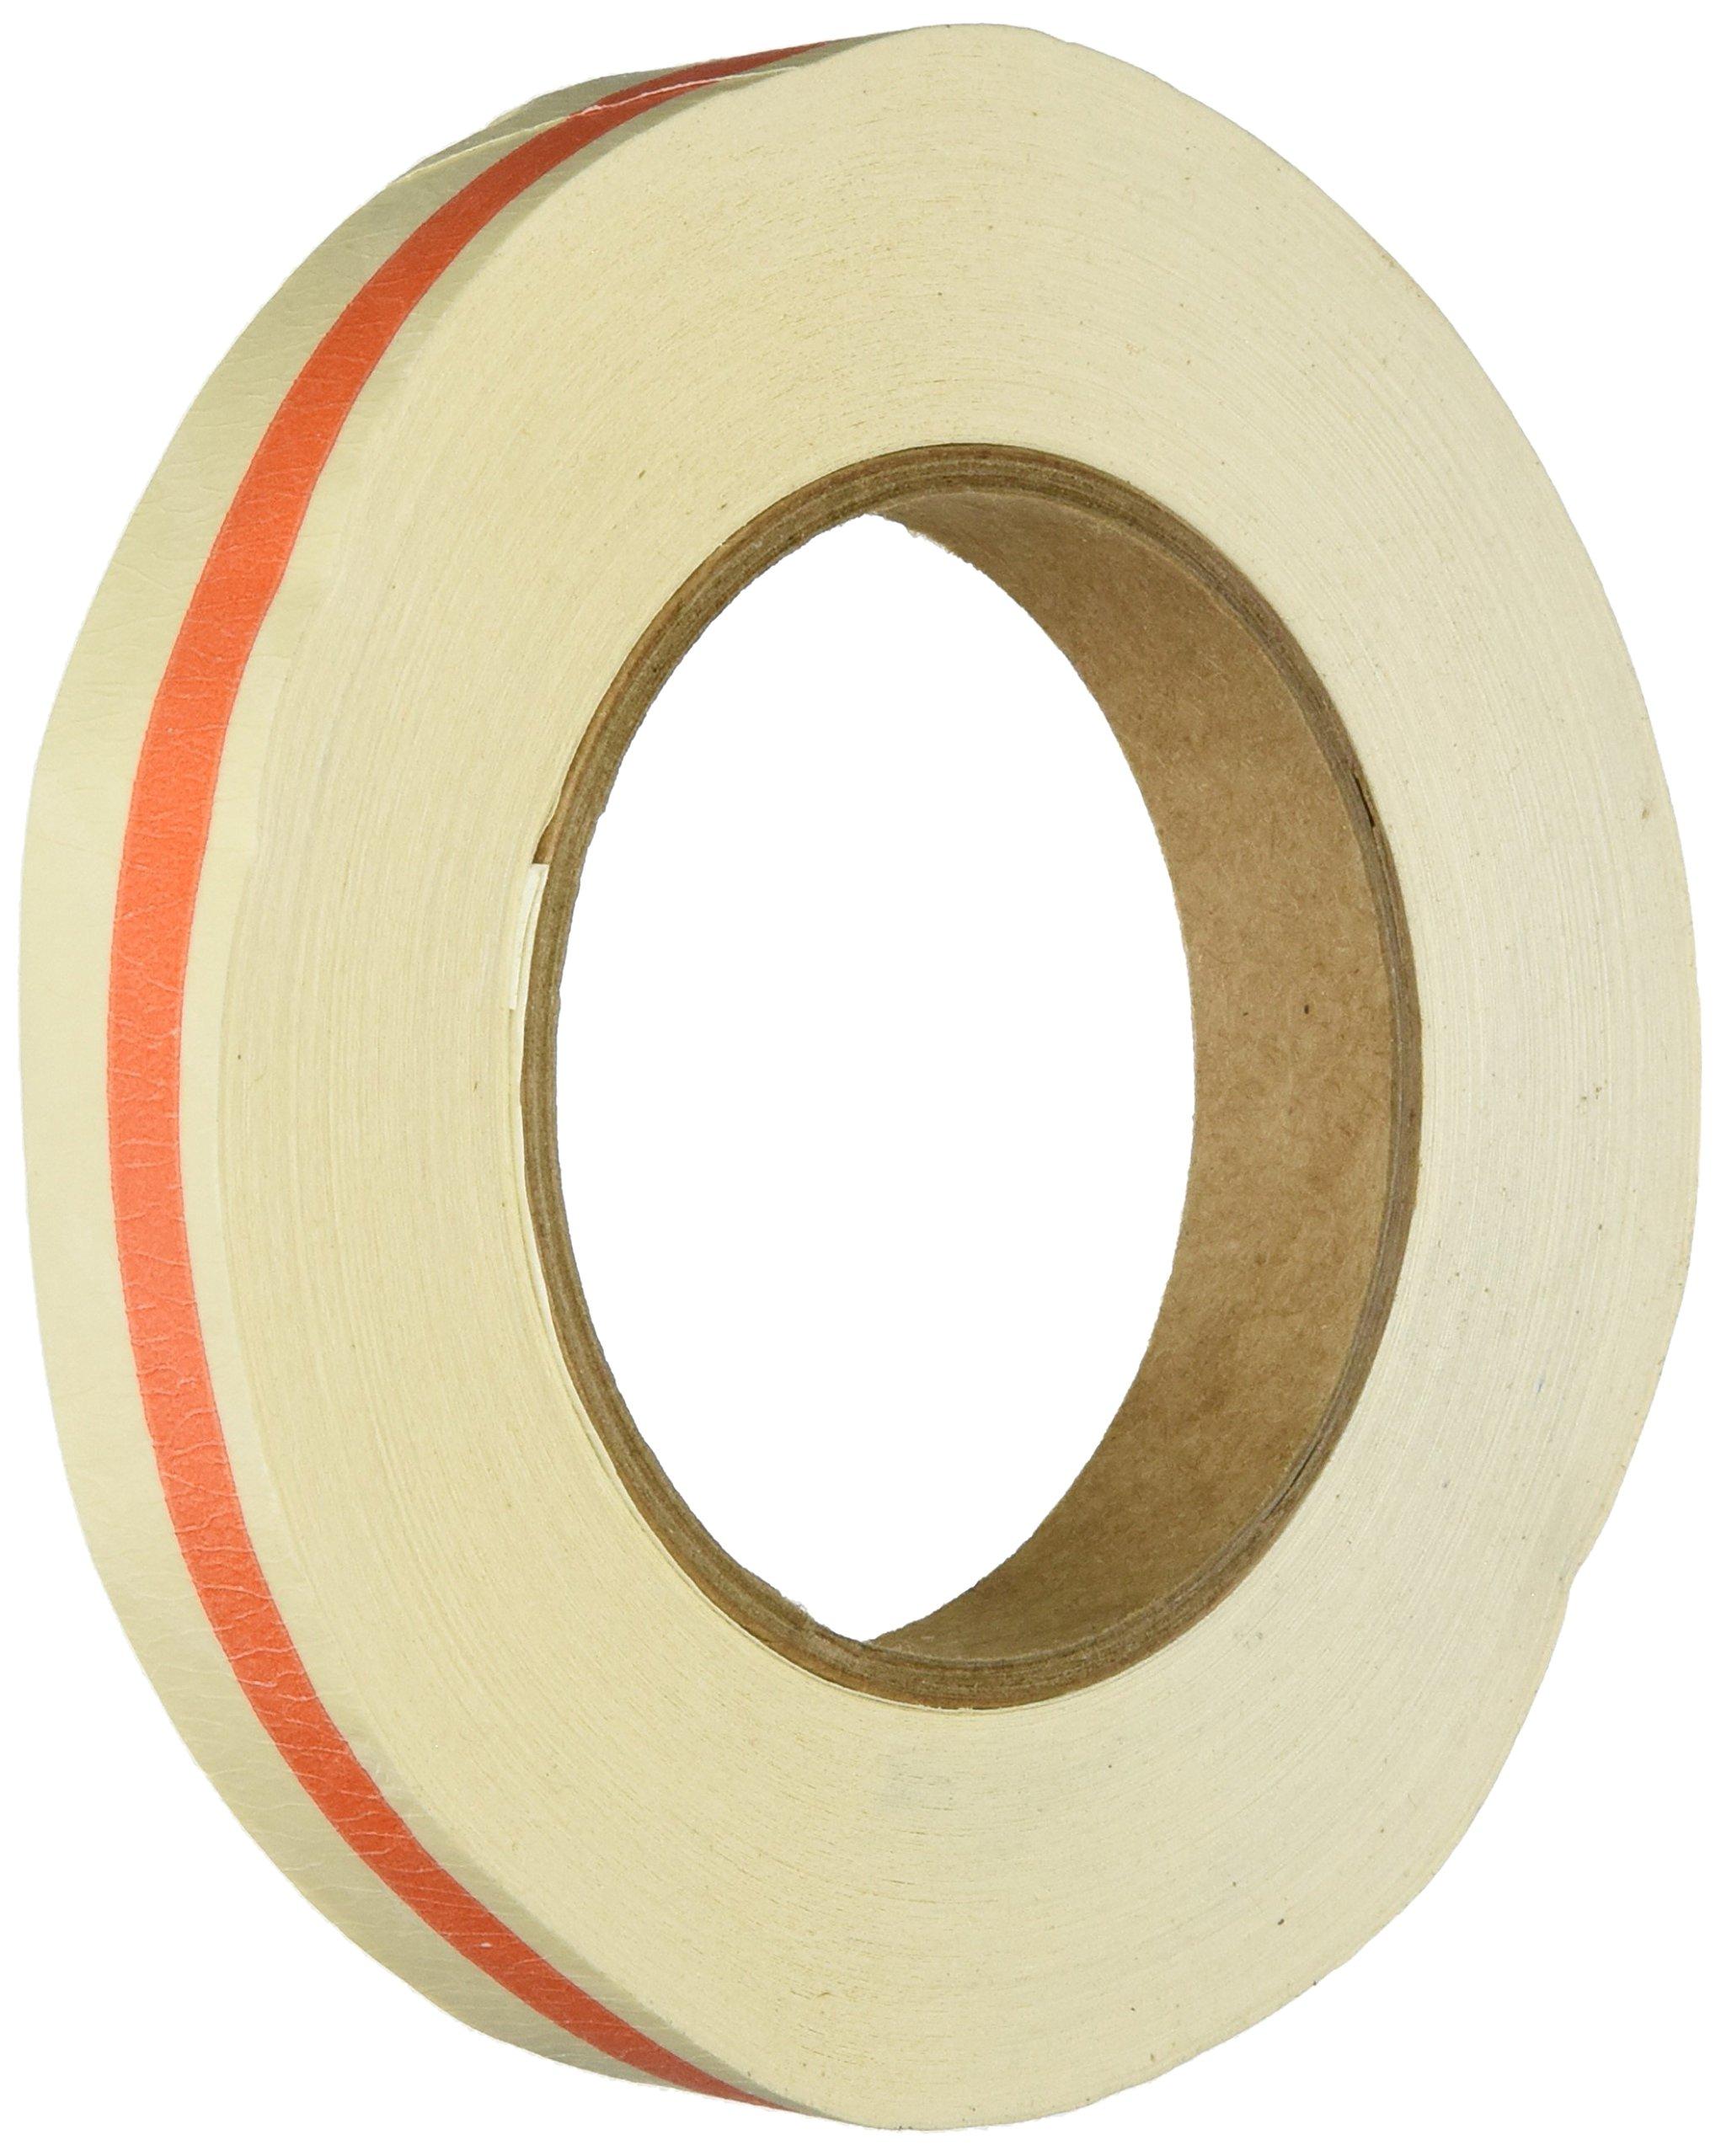 Hu-Friedy IMS-1263 Autoclave Monitor Tape, 3/4 Length, 55 mm Length, Orange